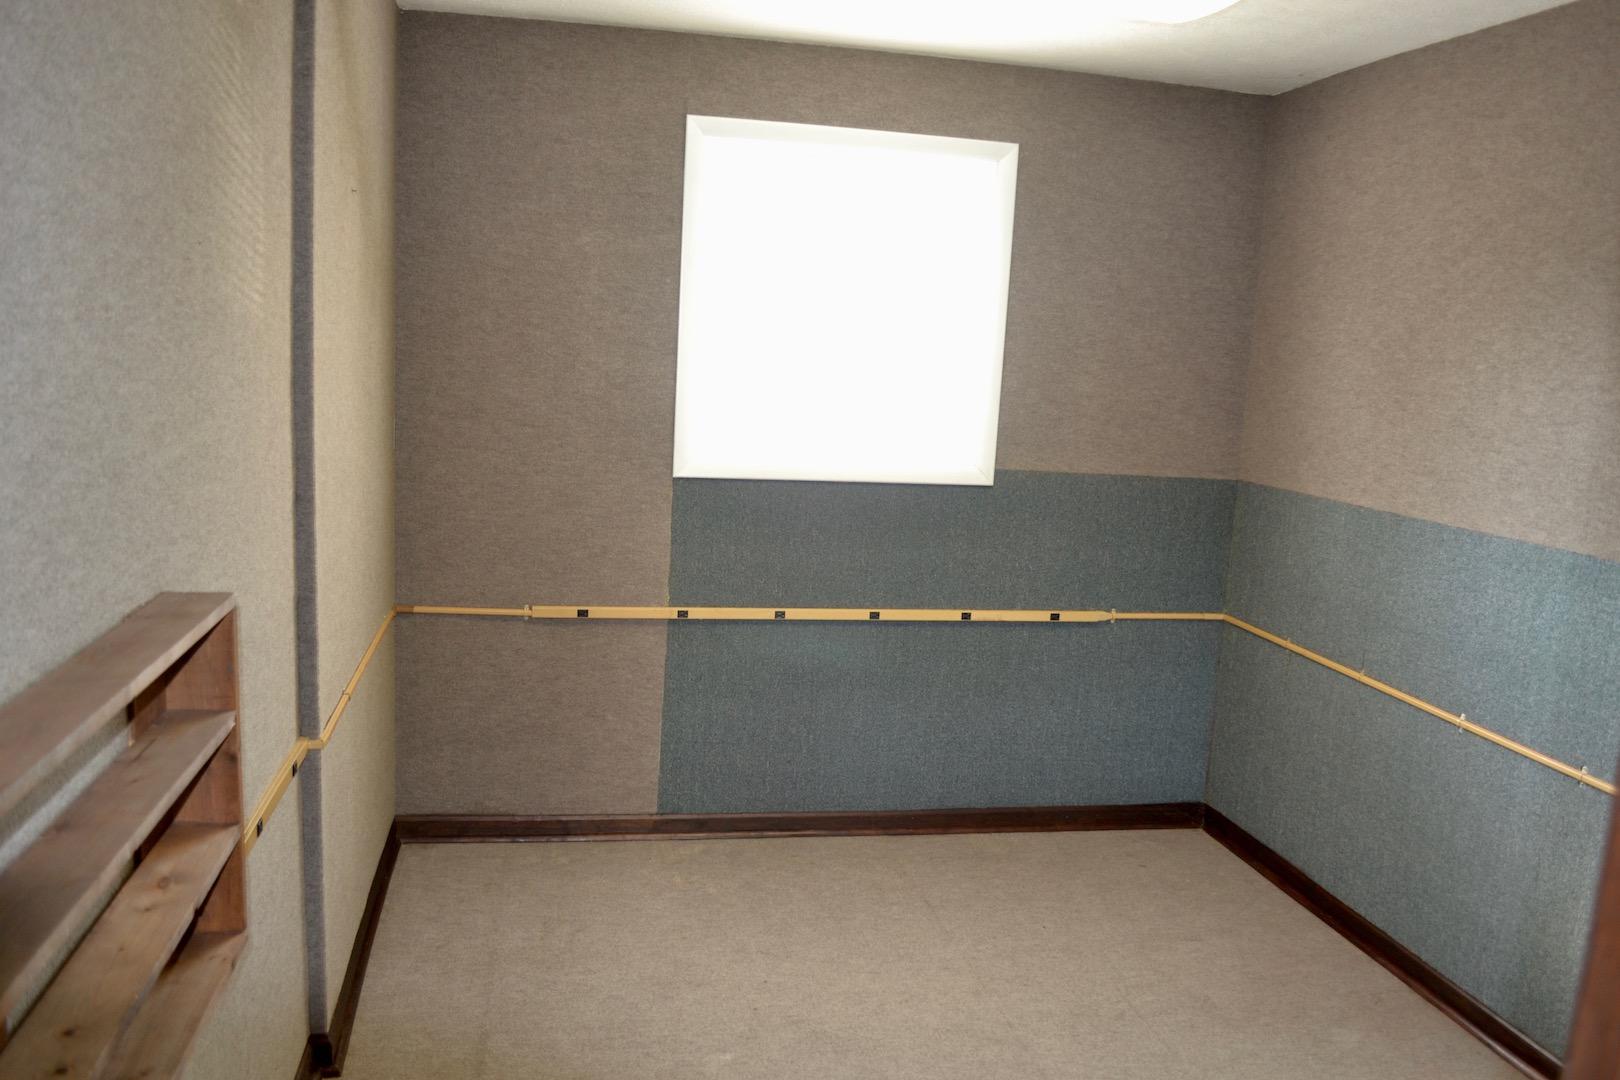 20-First Floor-Individual Office Side-Office 2-1.jpg